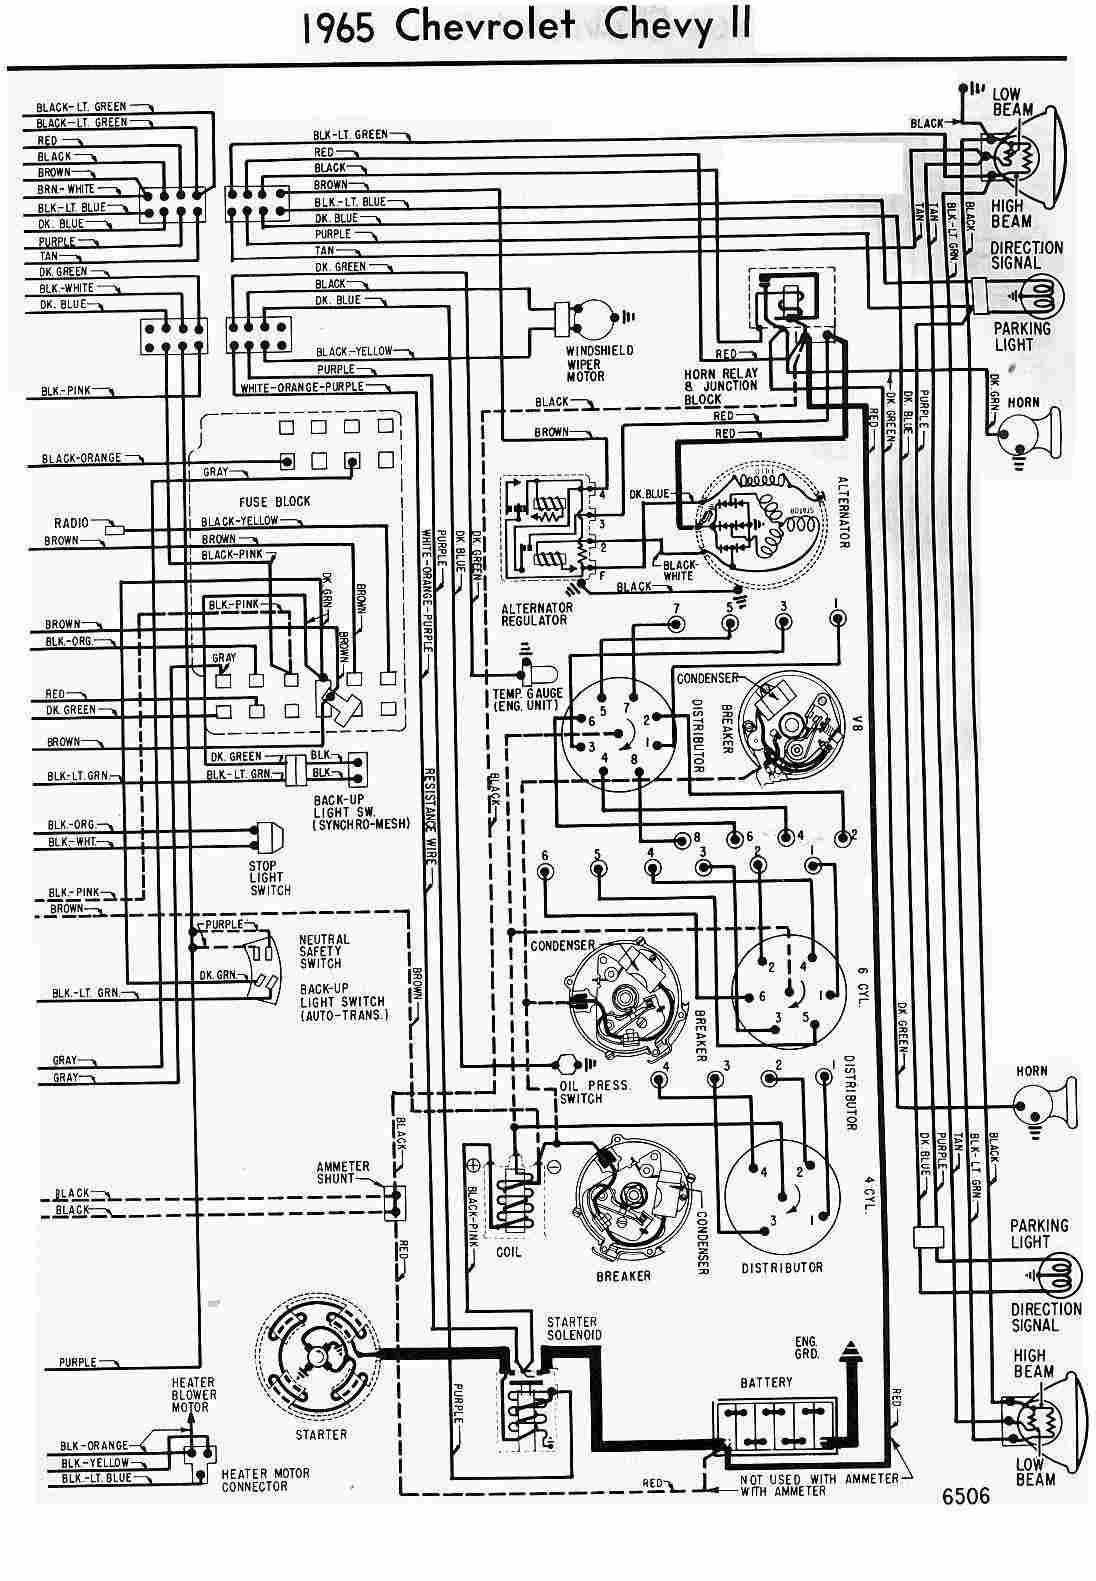 2003 chevy impala heater schematic simple wiring post rh 37 asiagourmet igb de 1966 impala wiring diagram 1961 impala wiring diagram [ 1096 x 1581 Pixel ]